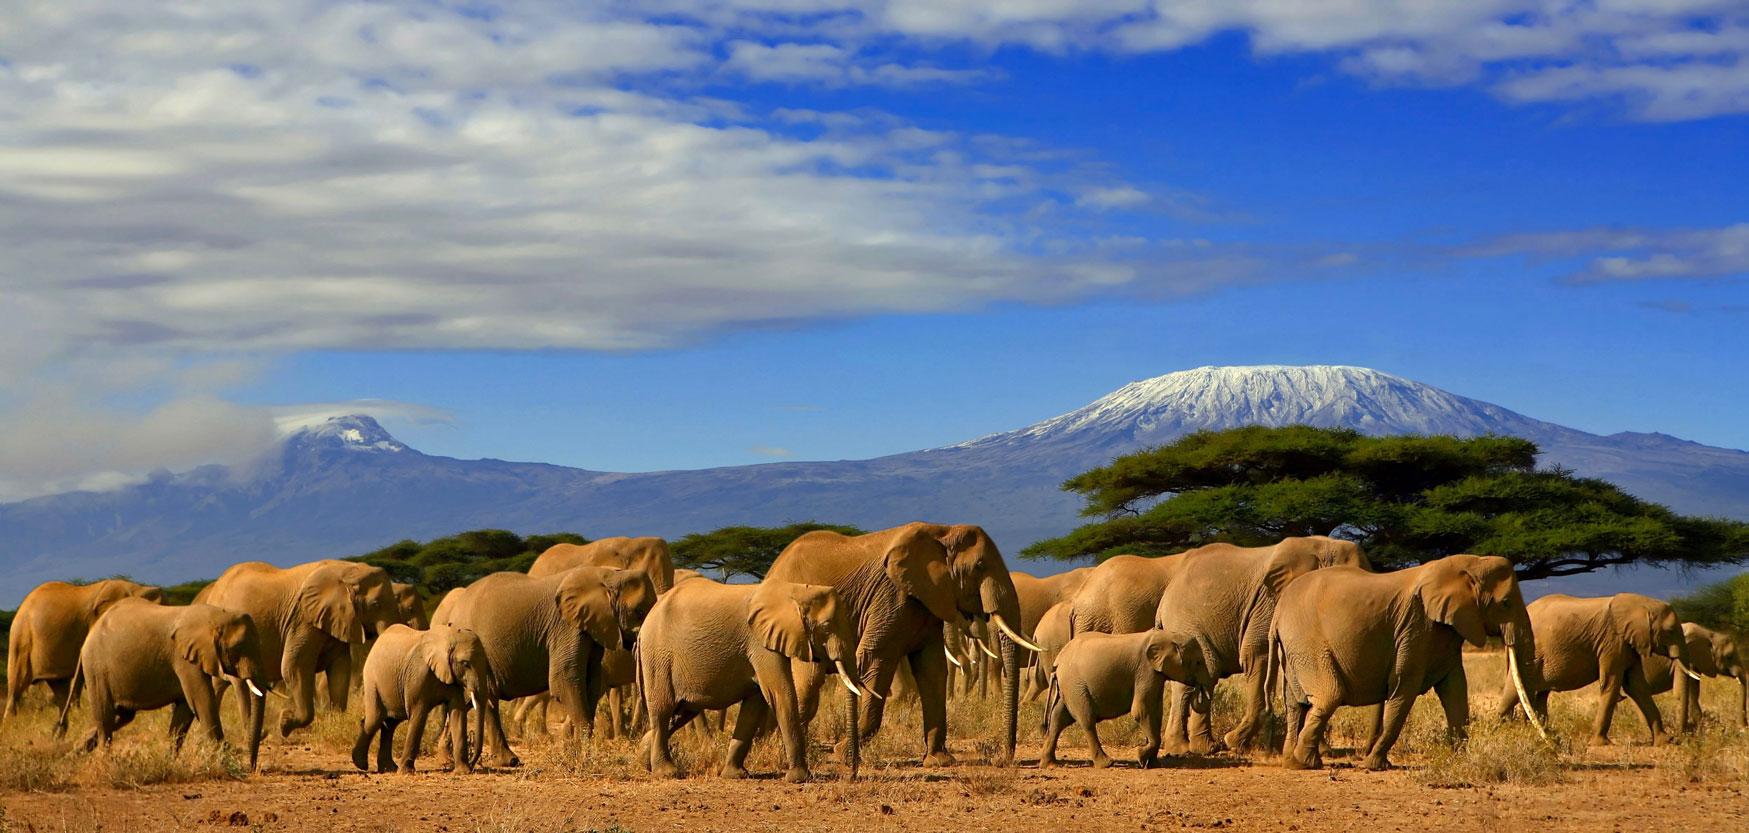 Hiking to the Summit of Mount Kilimanjaro